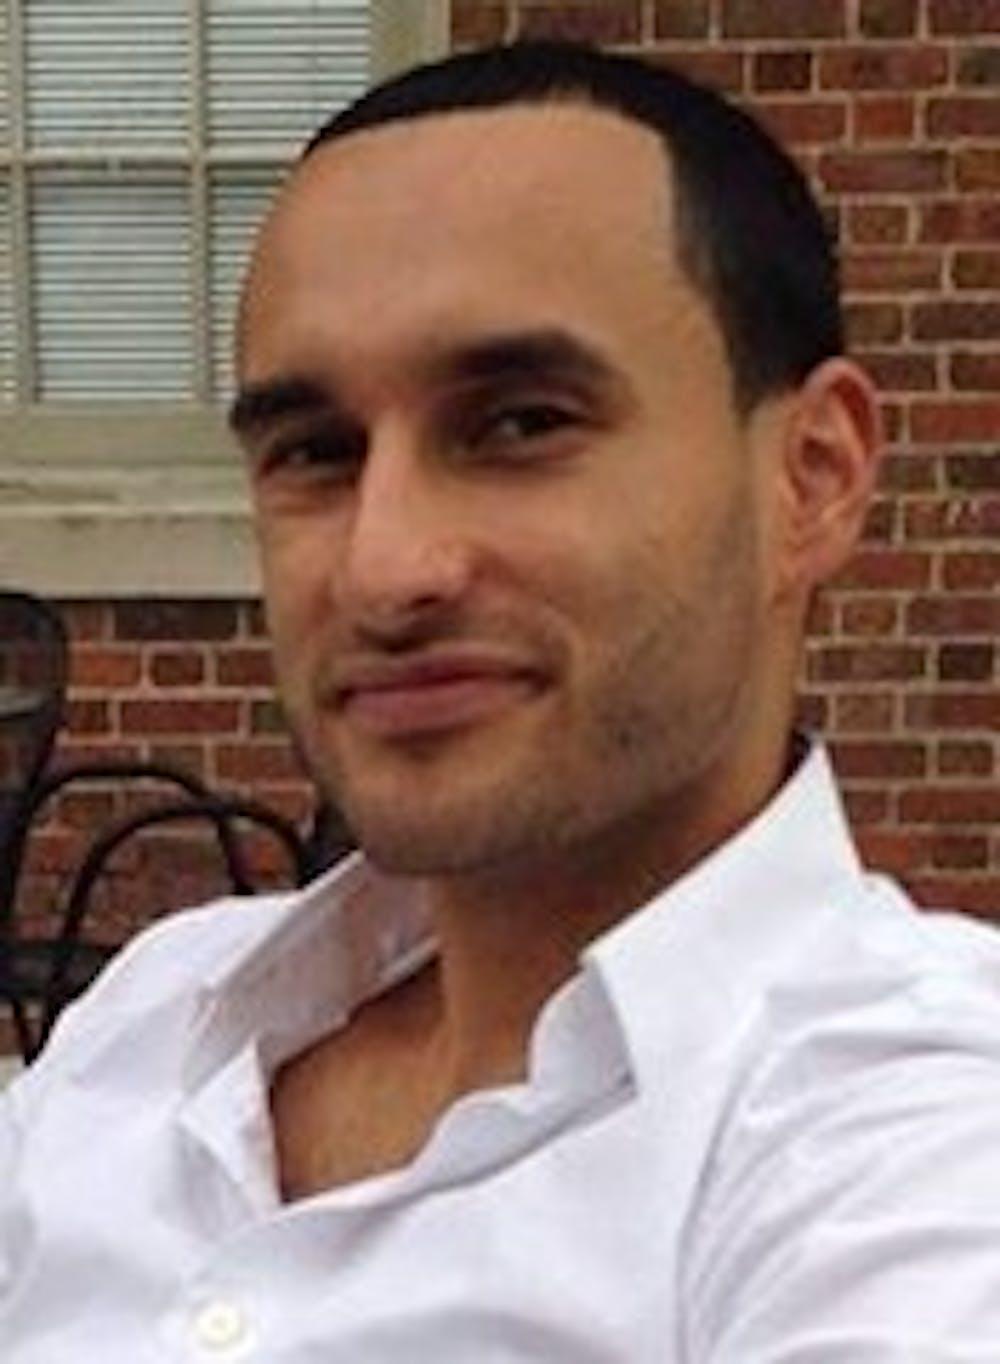 UNC dental student Sergio Acero dies in motorcycle accident